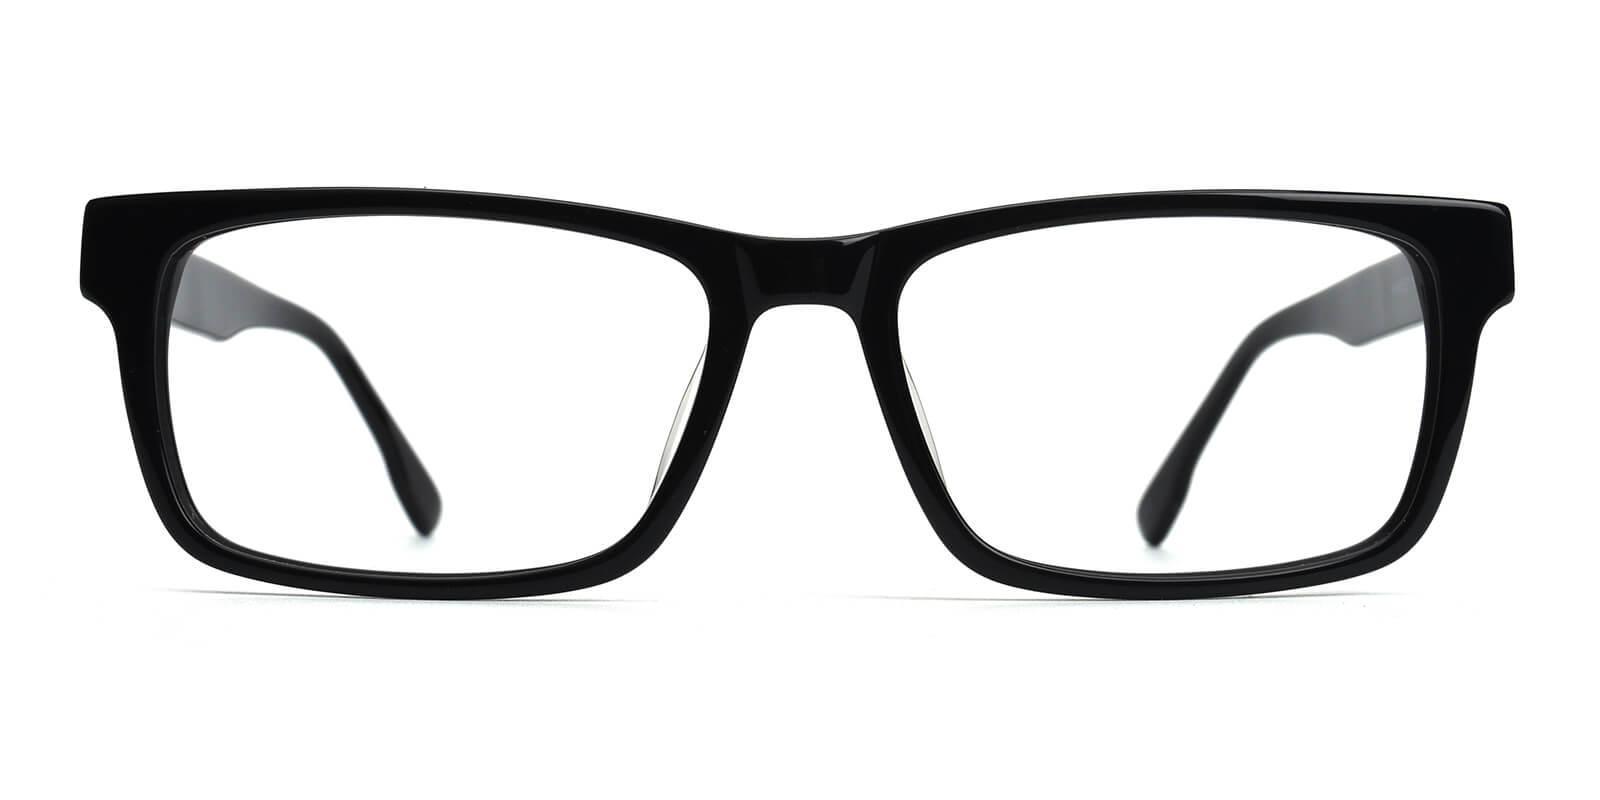 Obsidian-Black-Rectangle-Acetate-Eyeglasses-additional2